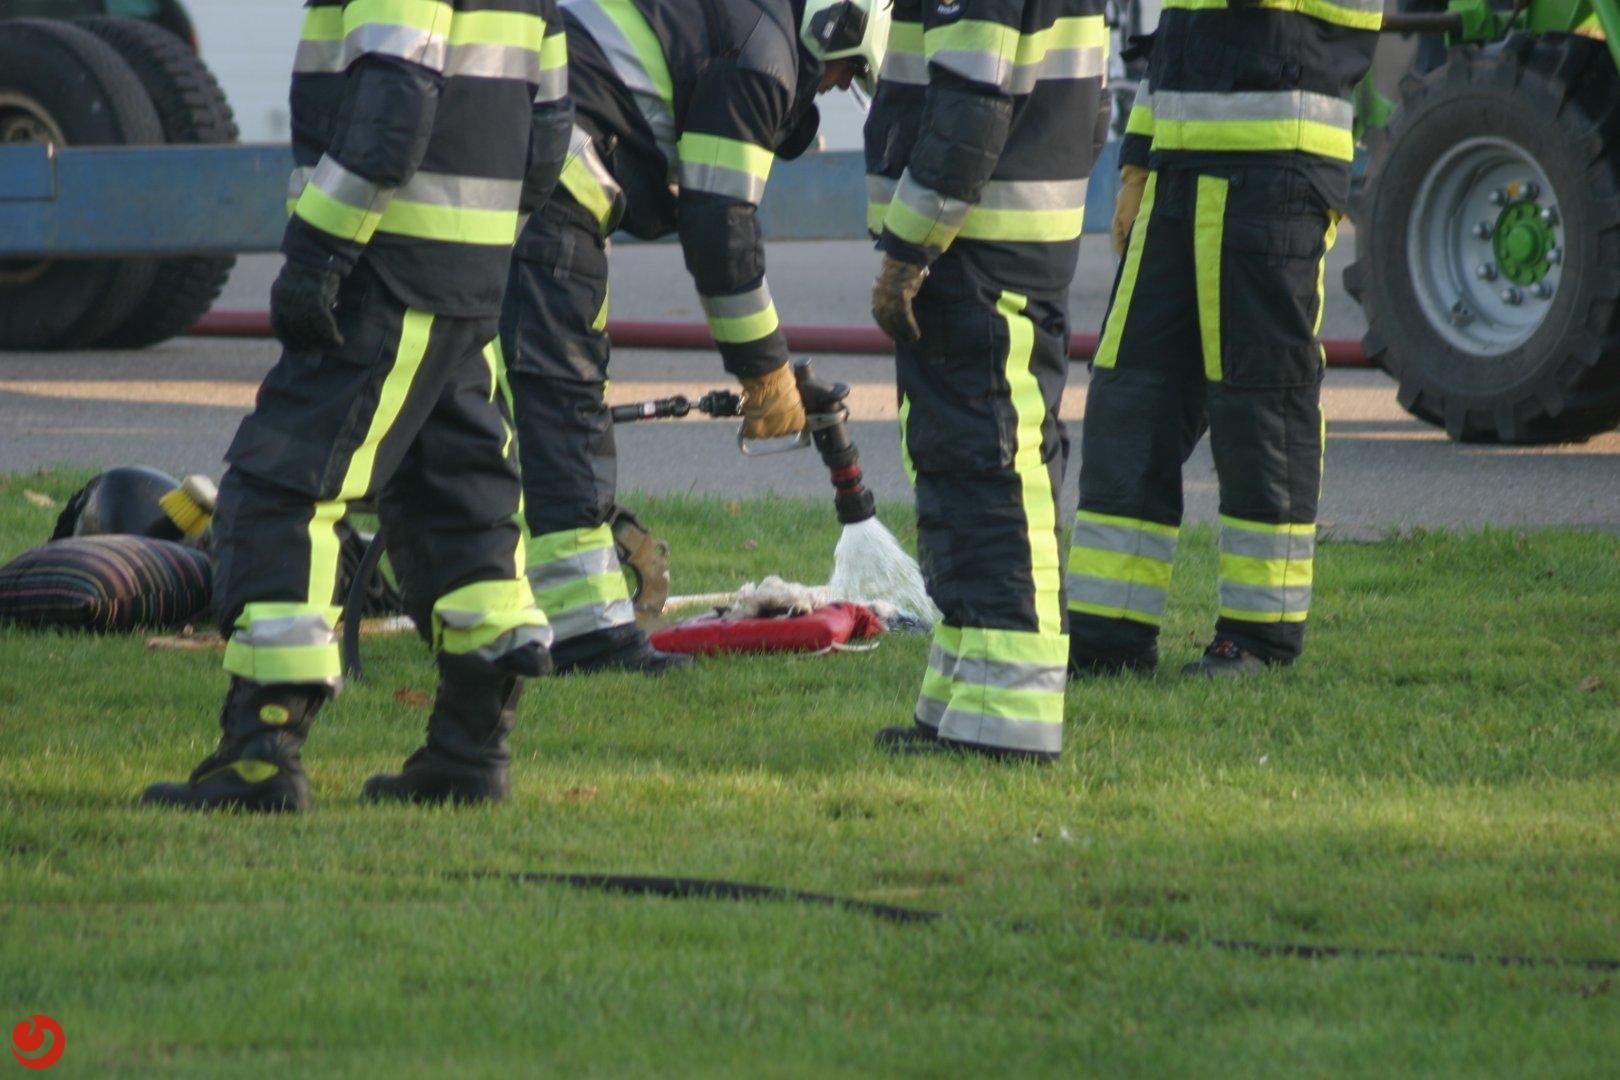 Smeulende matrassen in boot; brandweer voorkomt erger